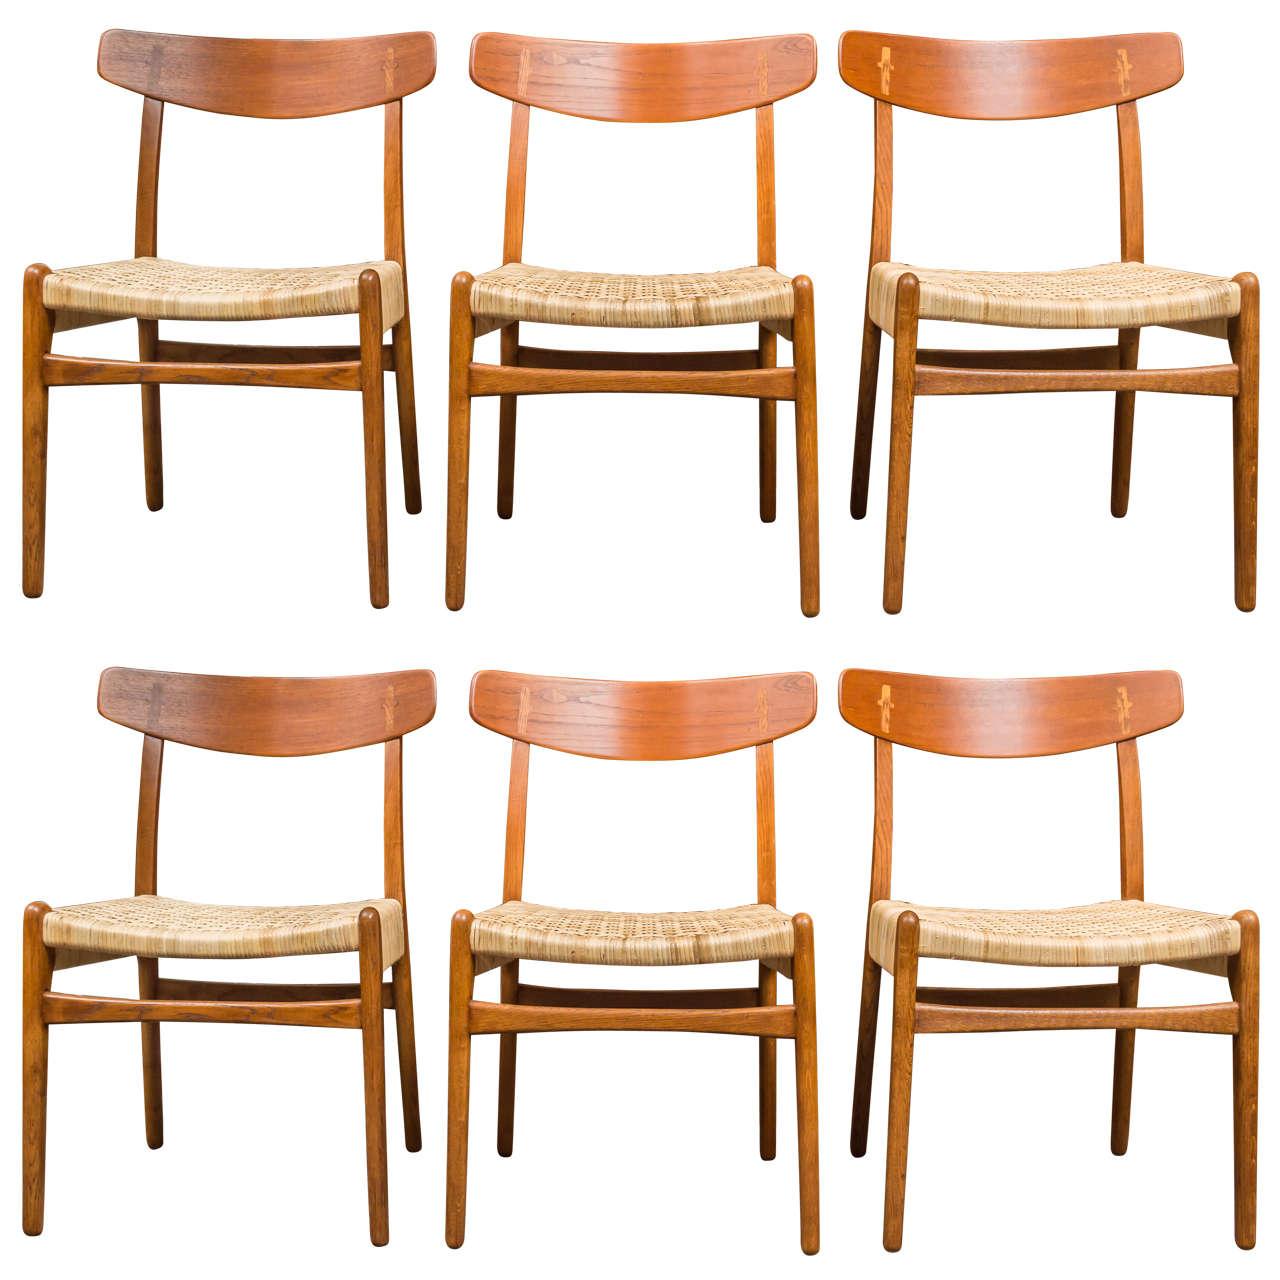 Hans j wegner dining chairs at 1stdibs for Wegner dining chair